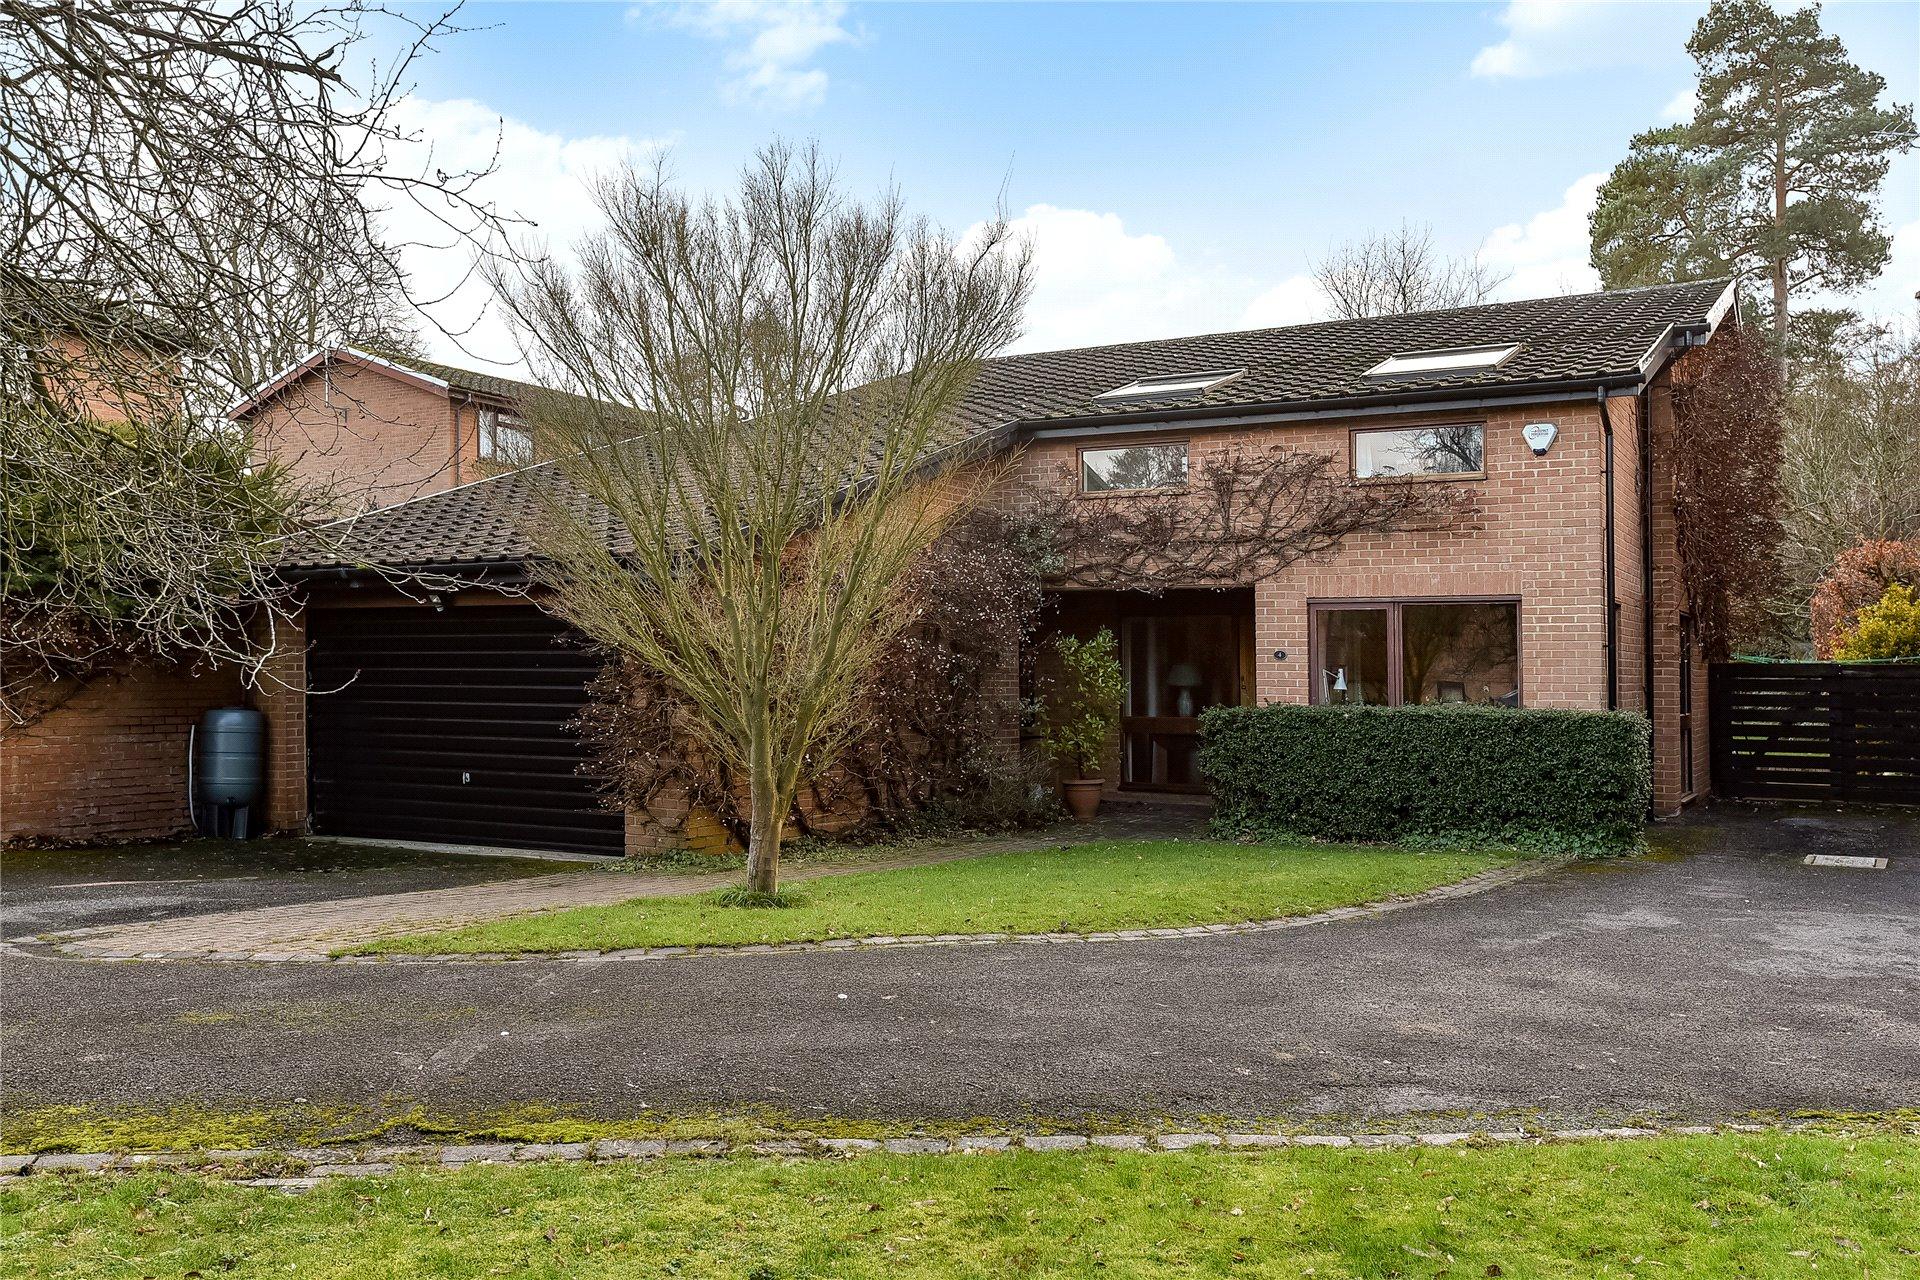 5 Bedrooms Detached House for sale in Coleridge Avenue, Yateley, Hampshire, GU46